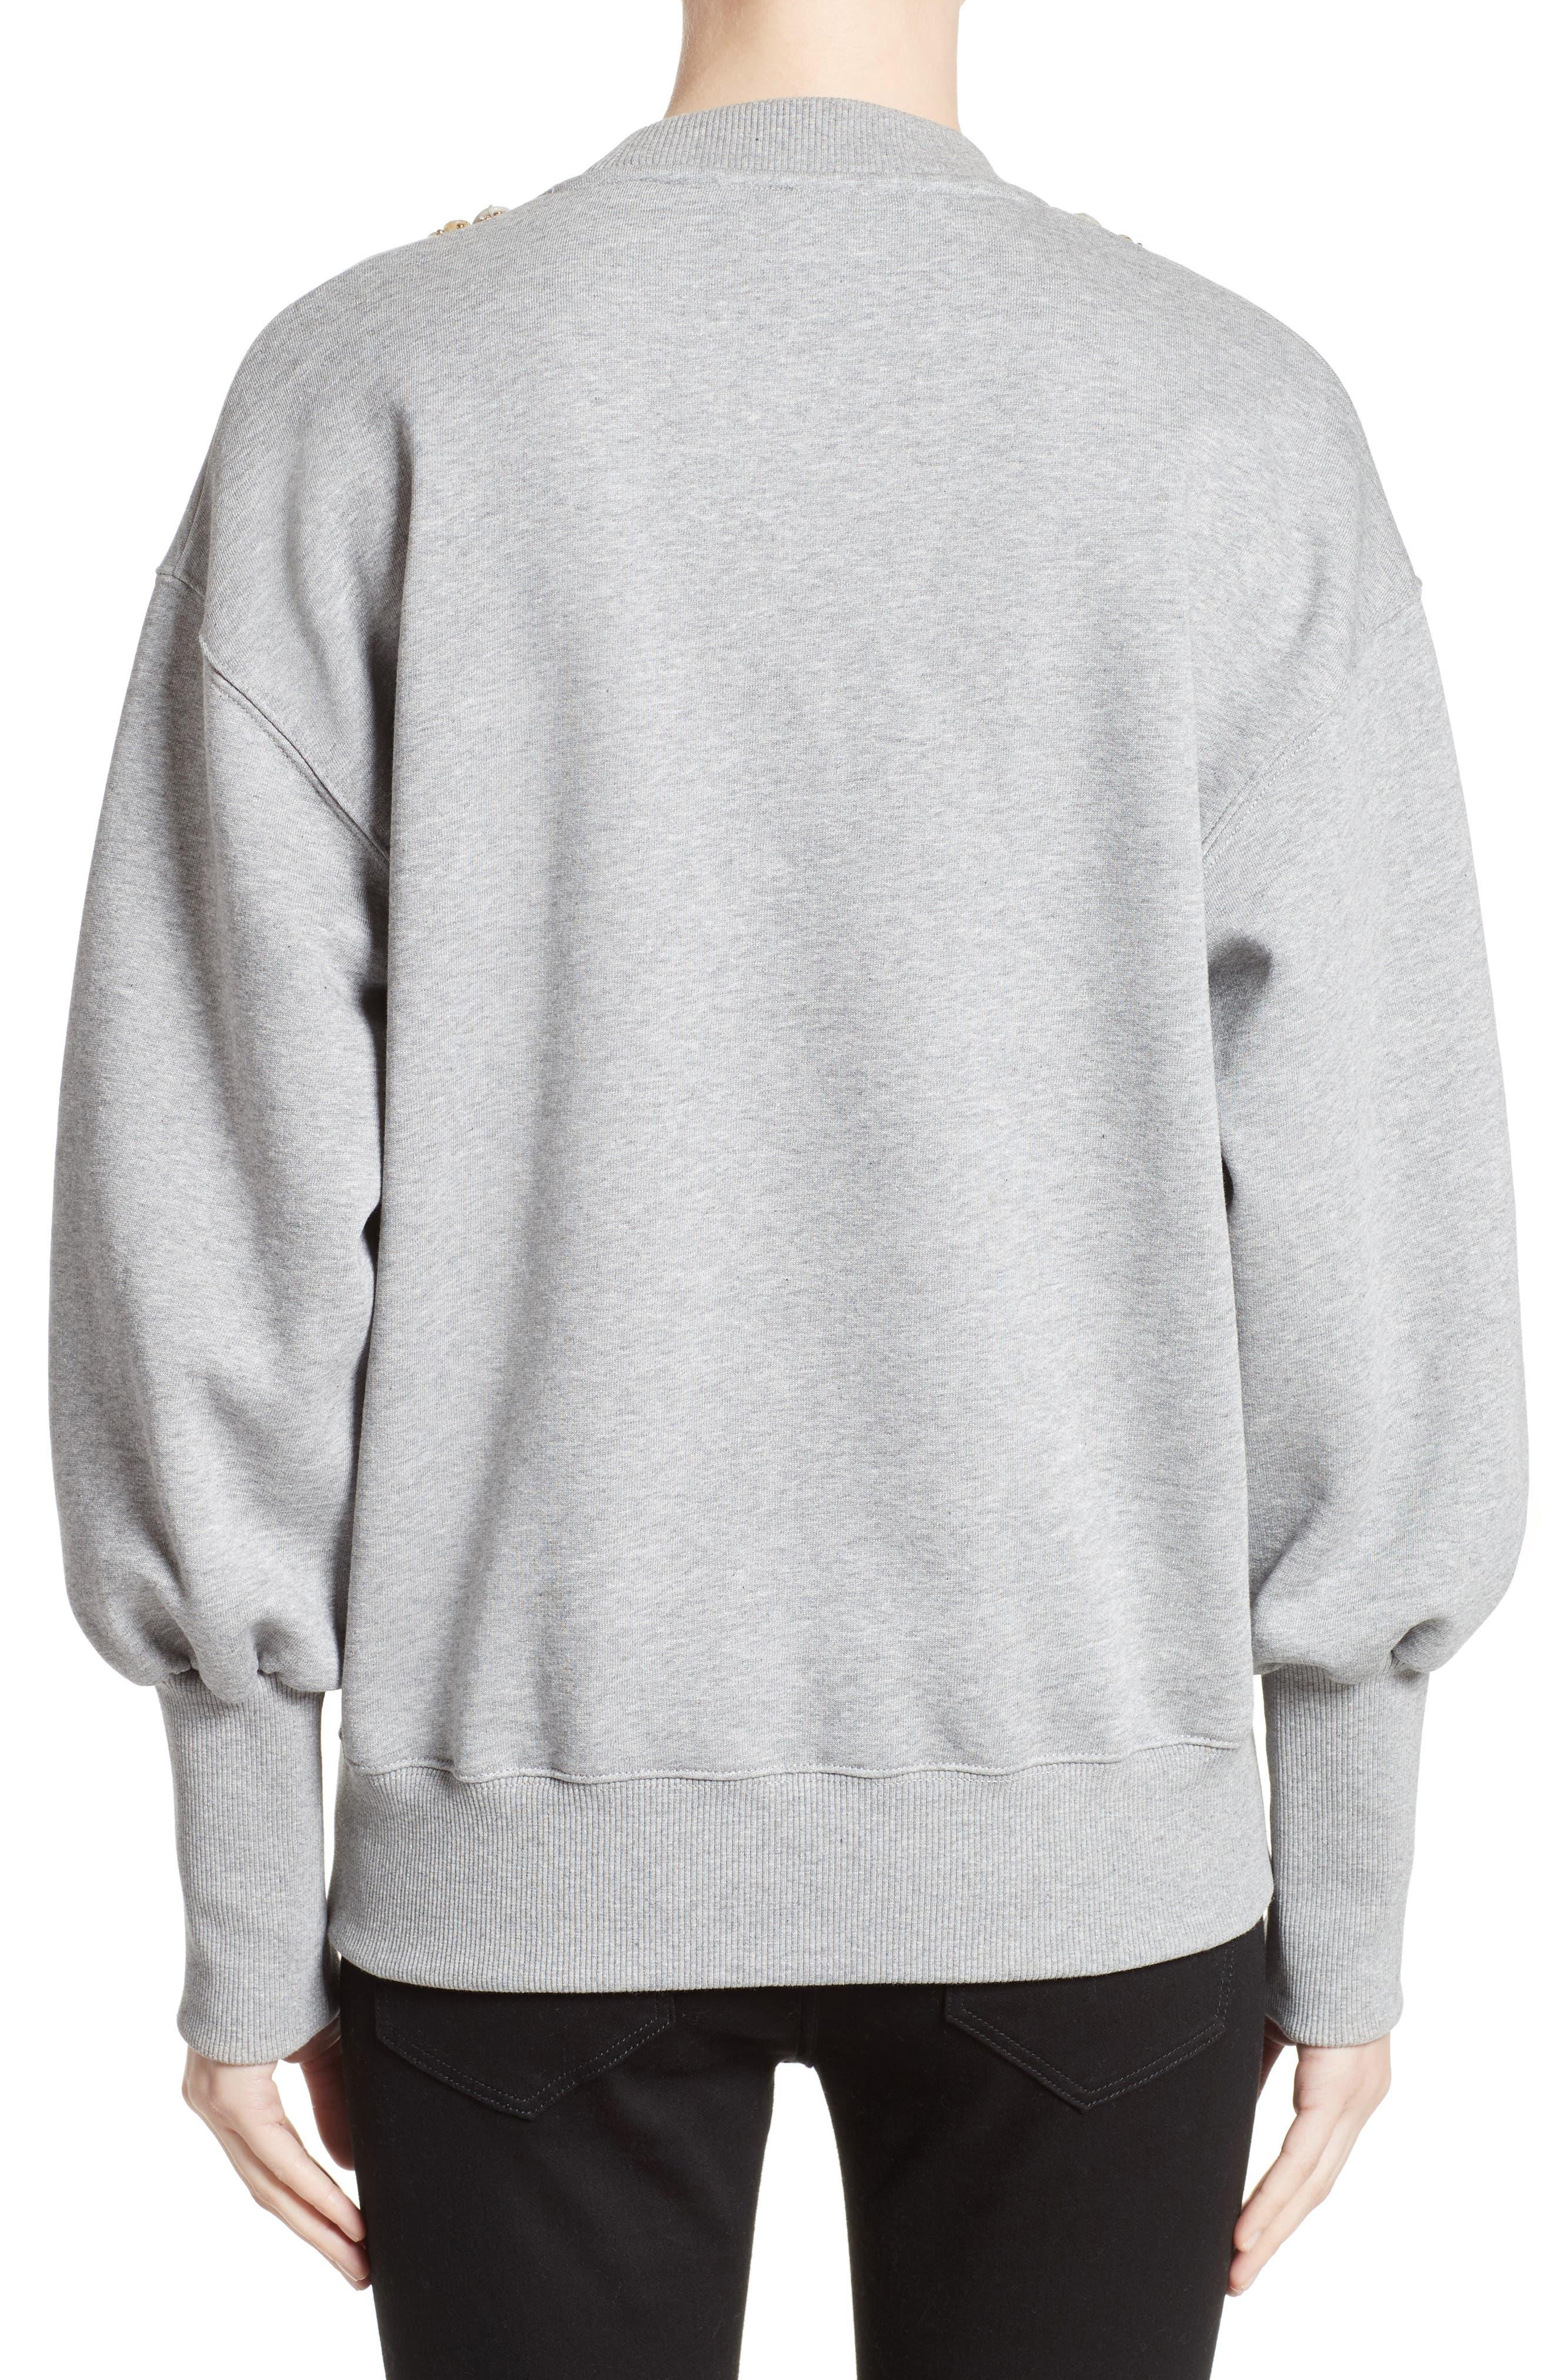 Juliano Embellished Sweatshirt,                             Alternate thumbnail 2, color,                             050